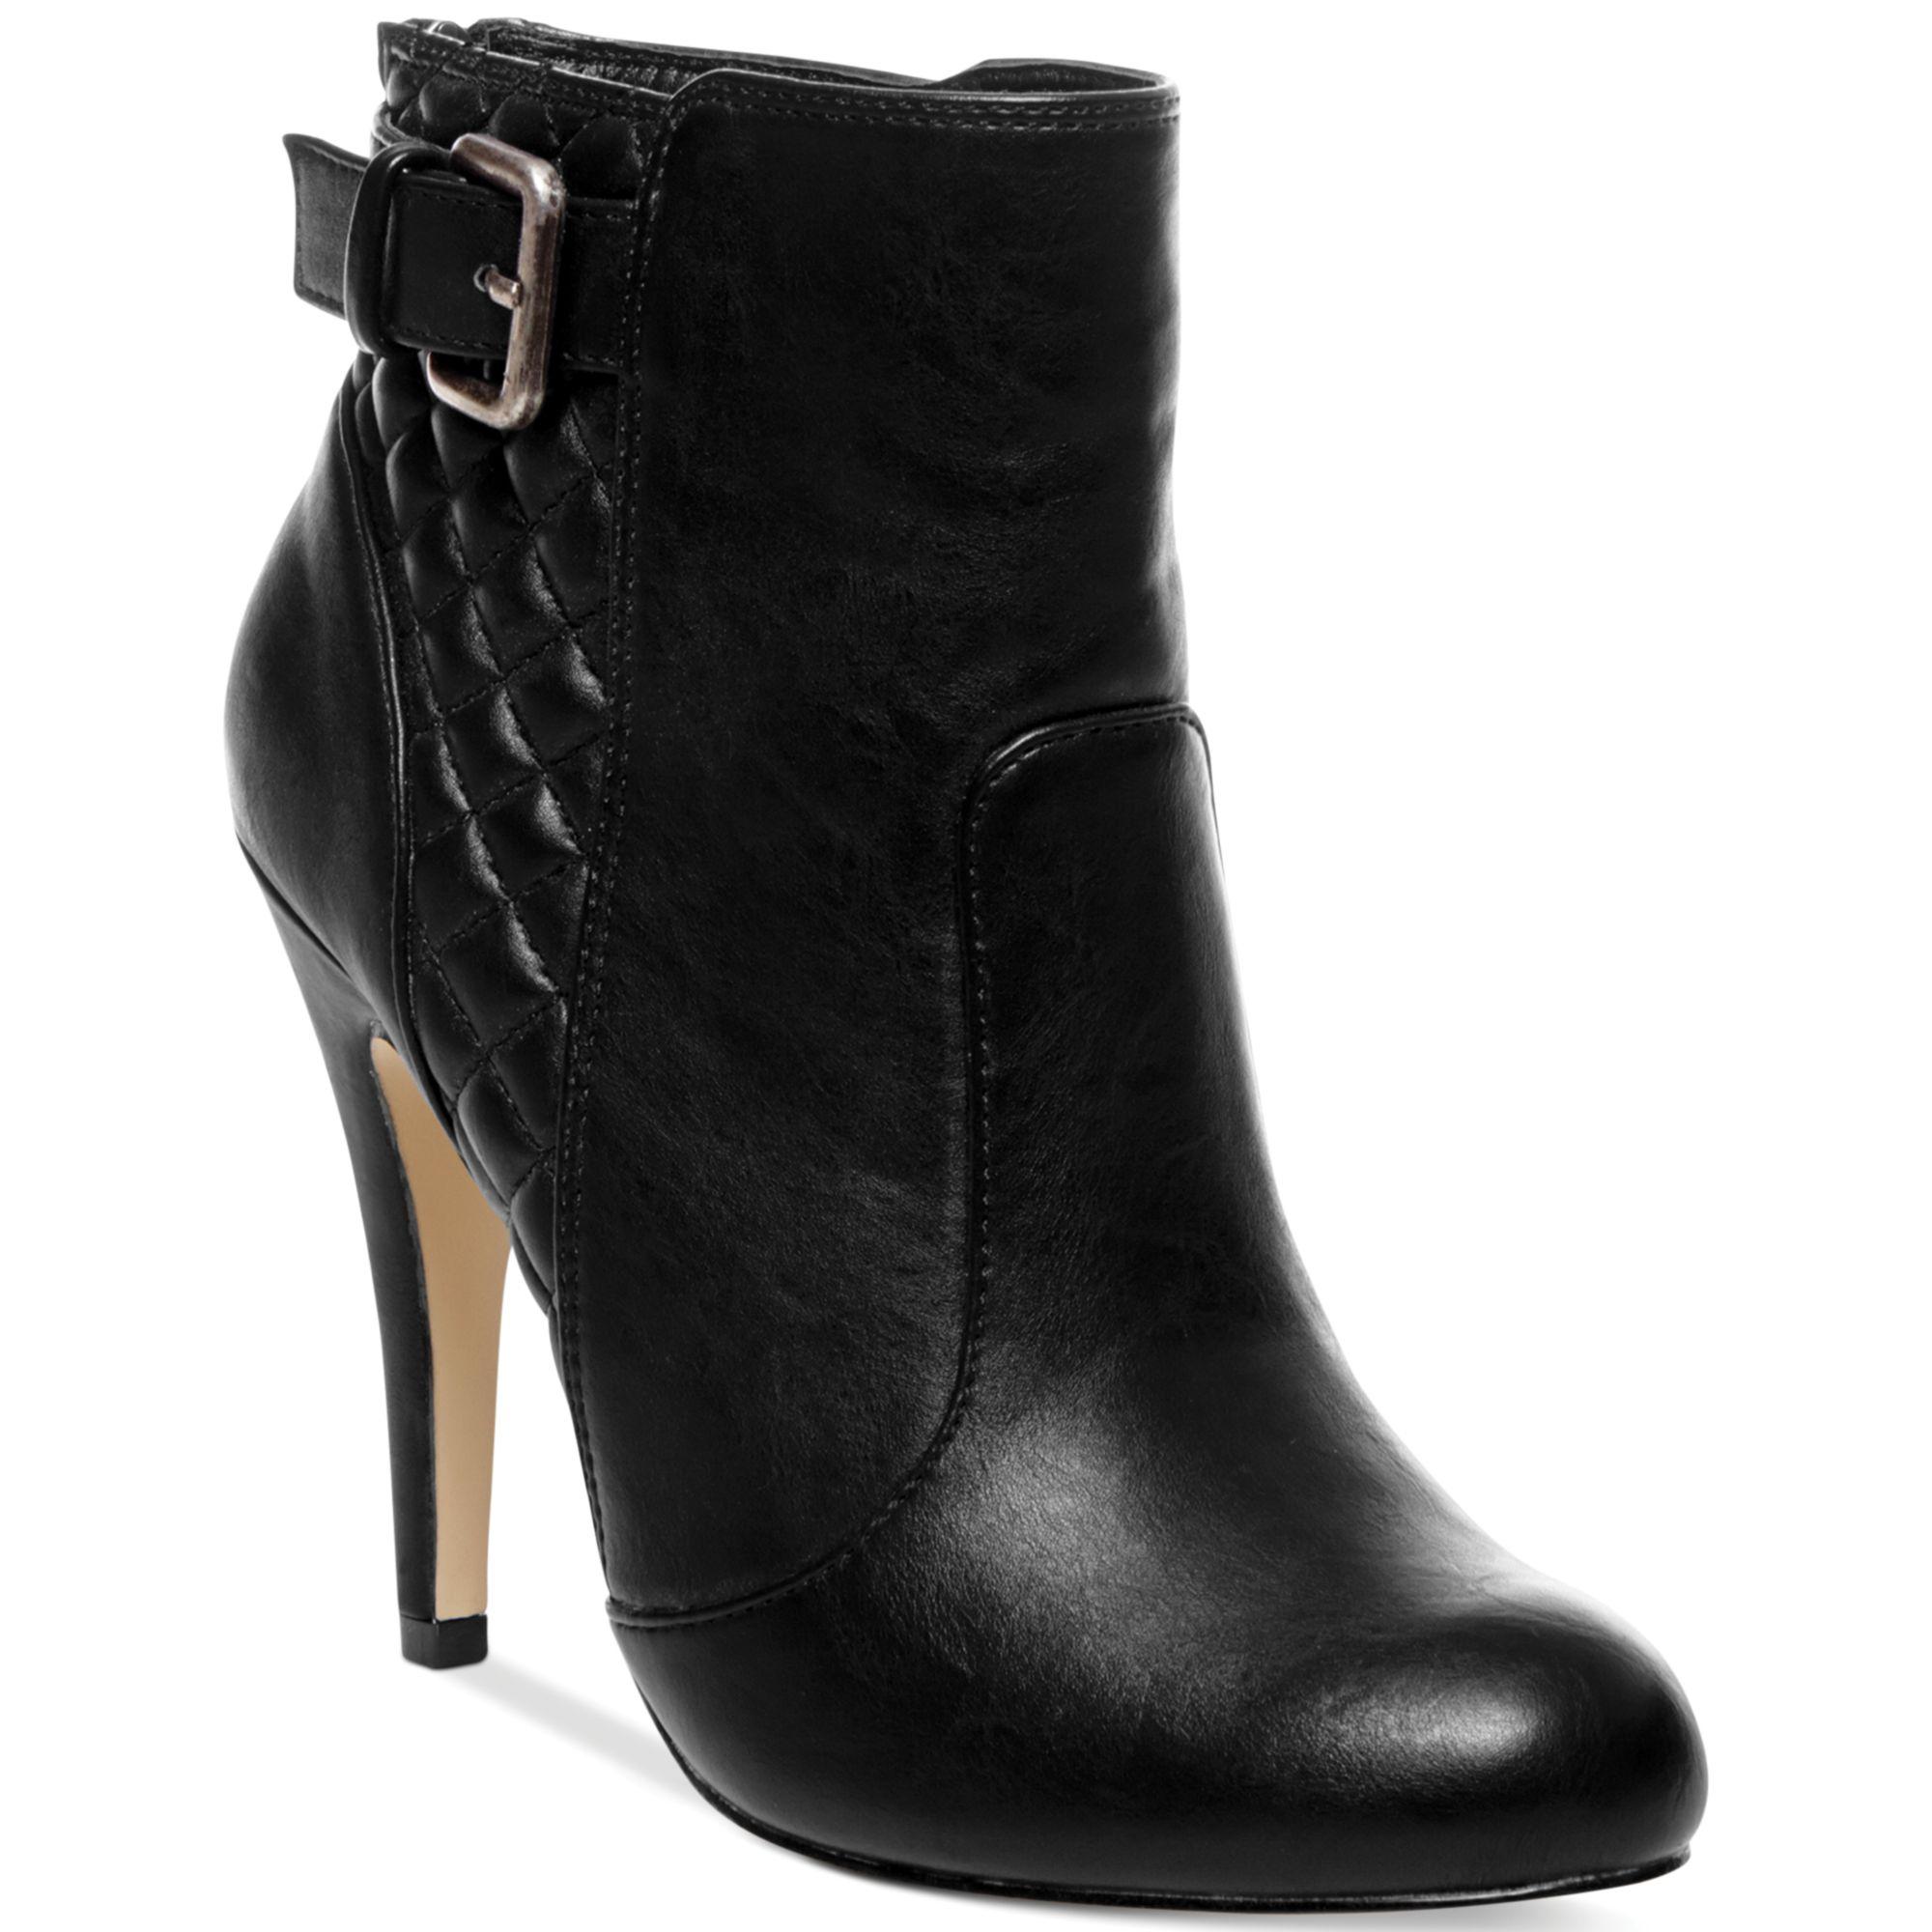 Lyst - Madden girl Ariiana Quilted Dress Booties in Black : quilted booties - Adamdwight.com